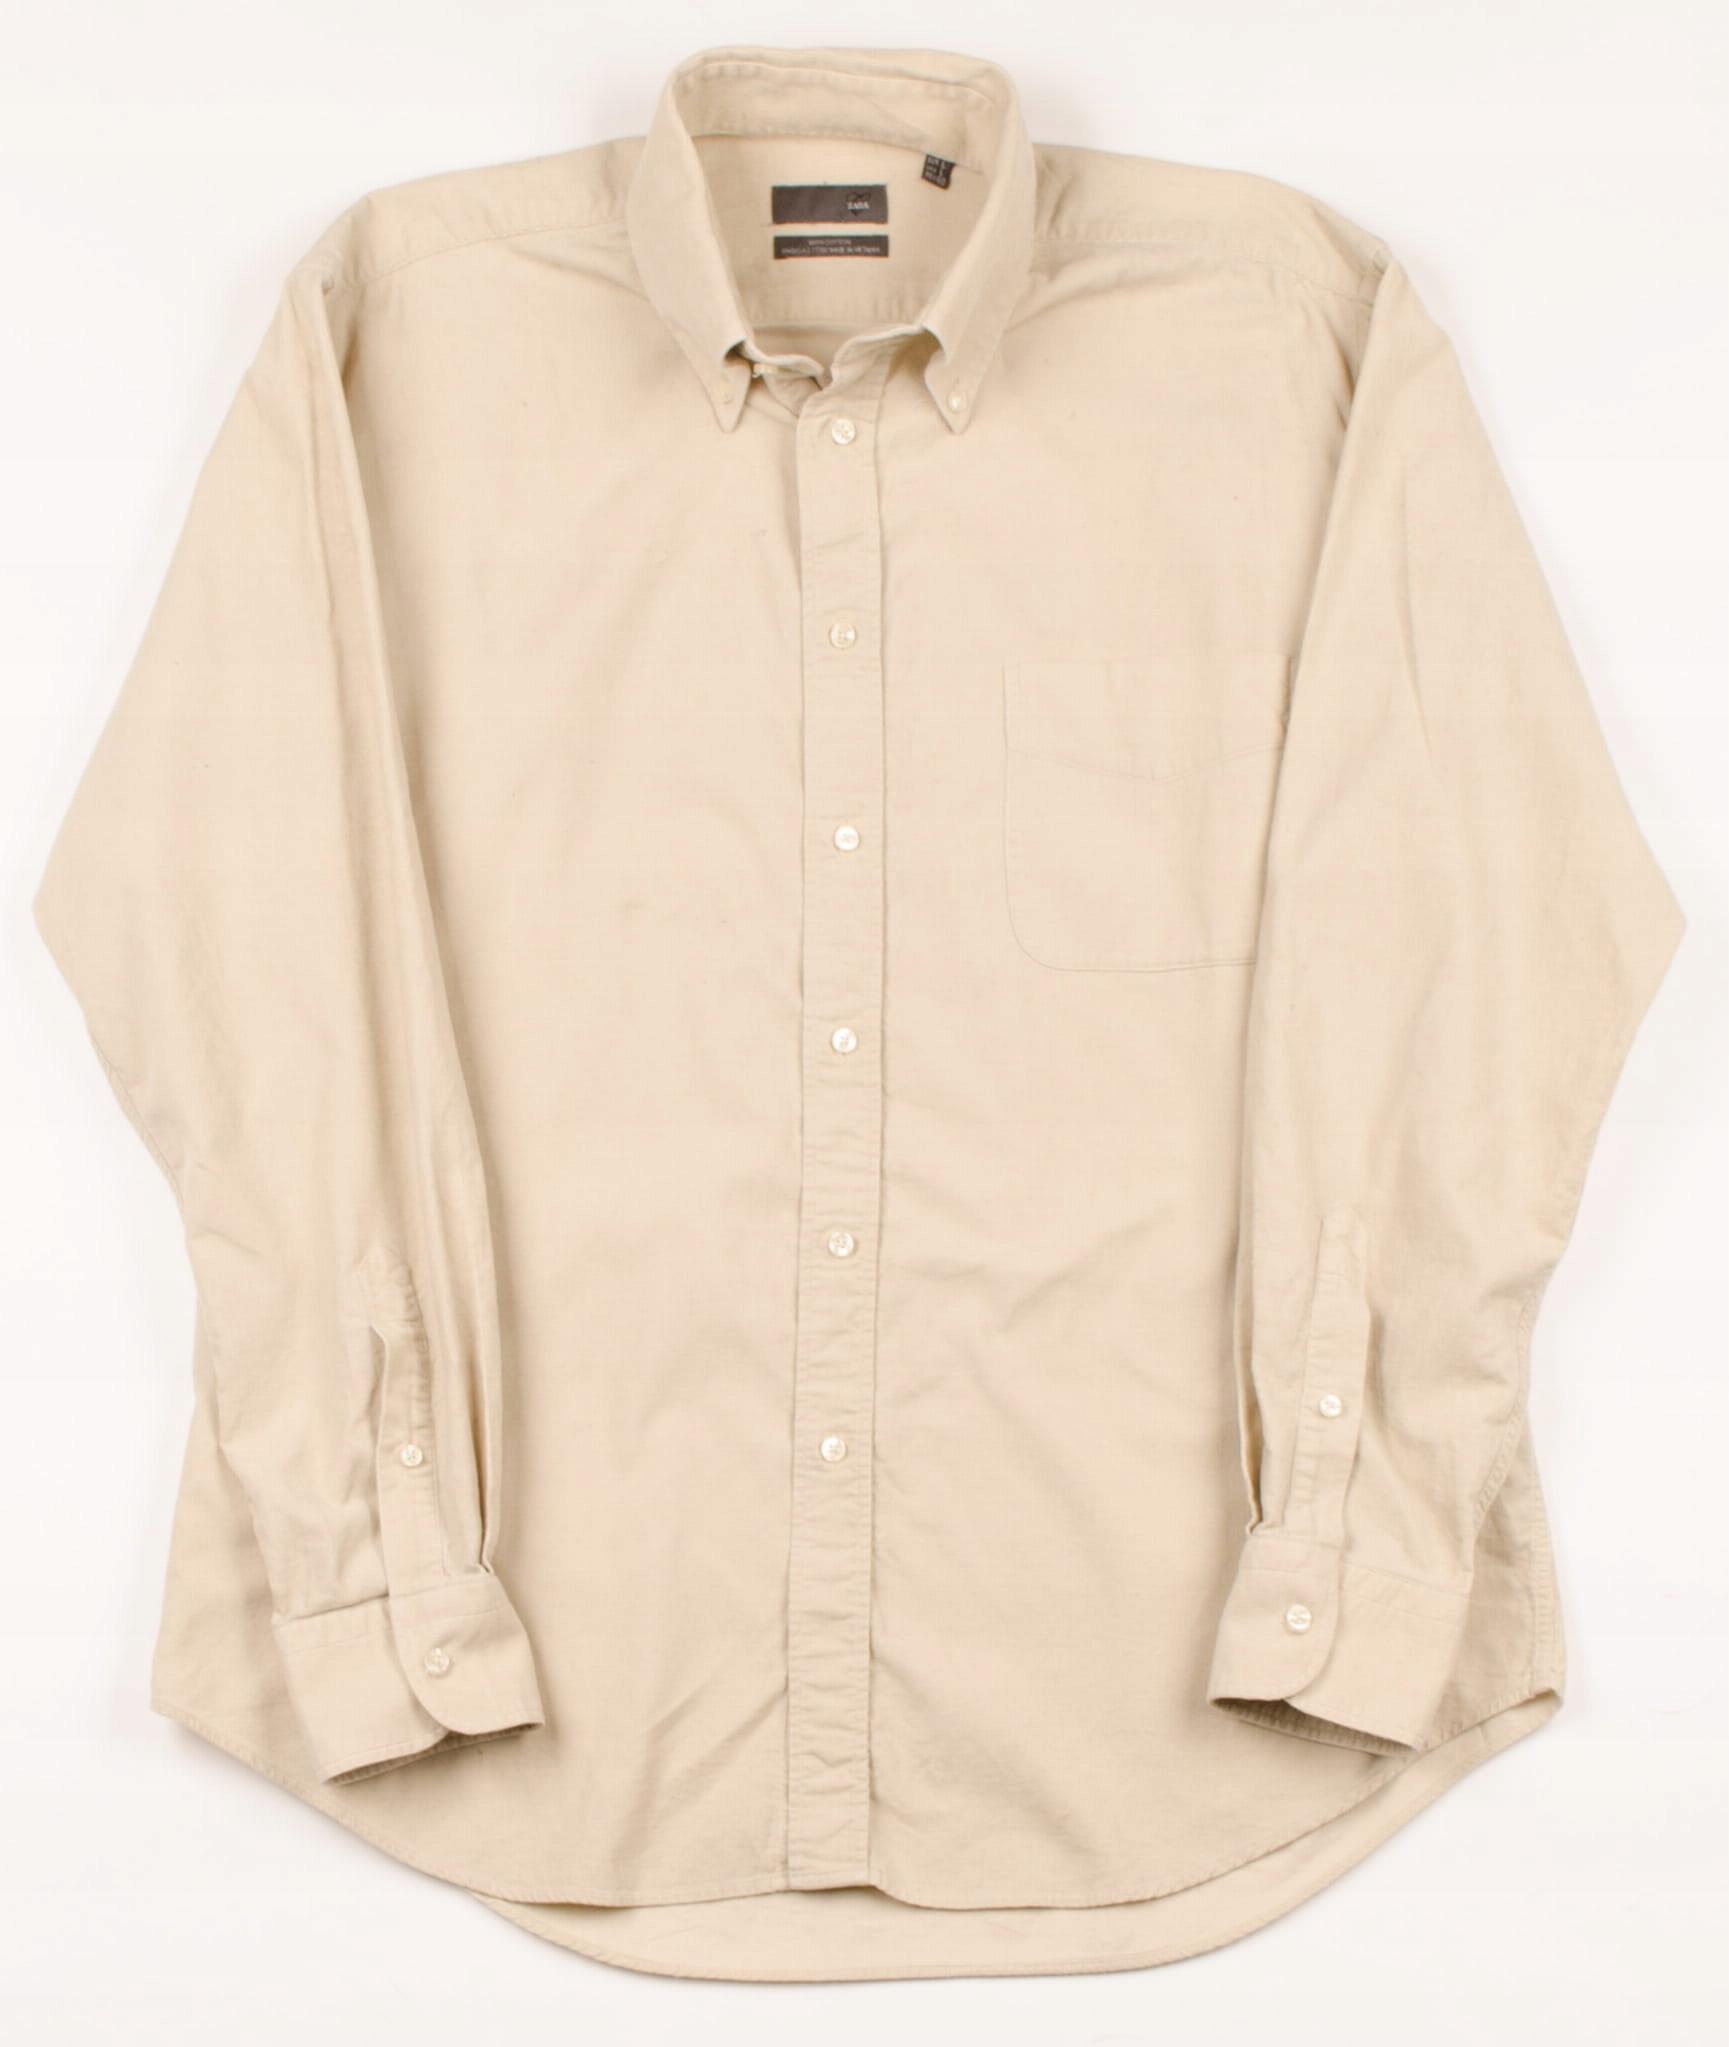 31008 Zara Koszula Męska L